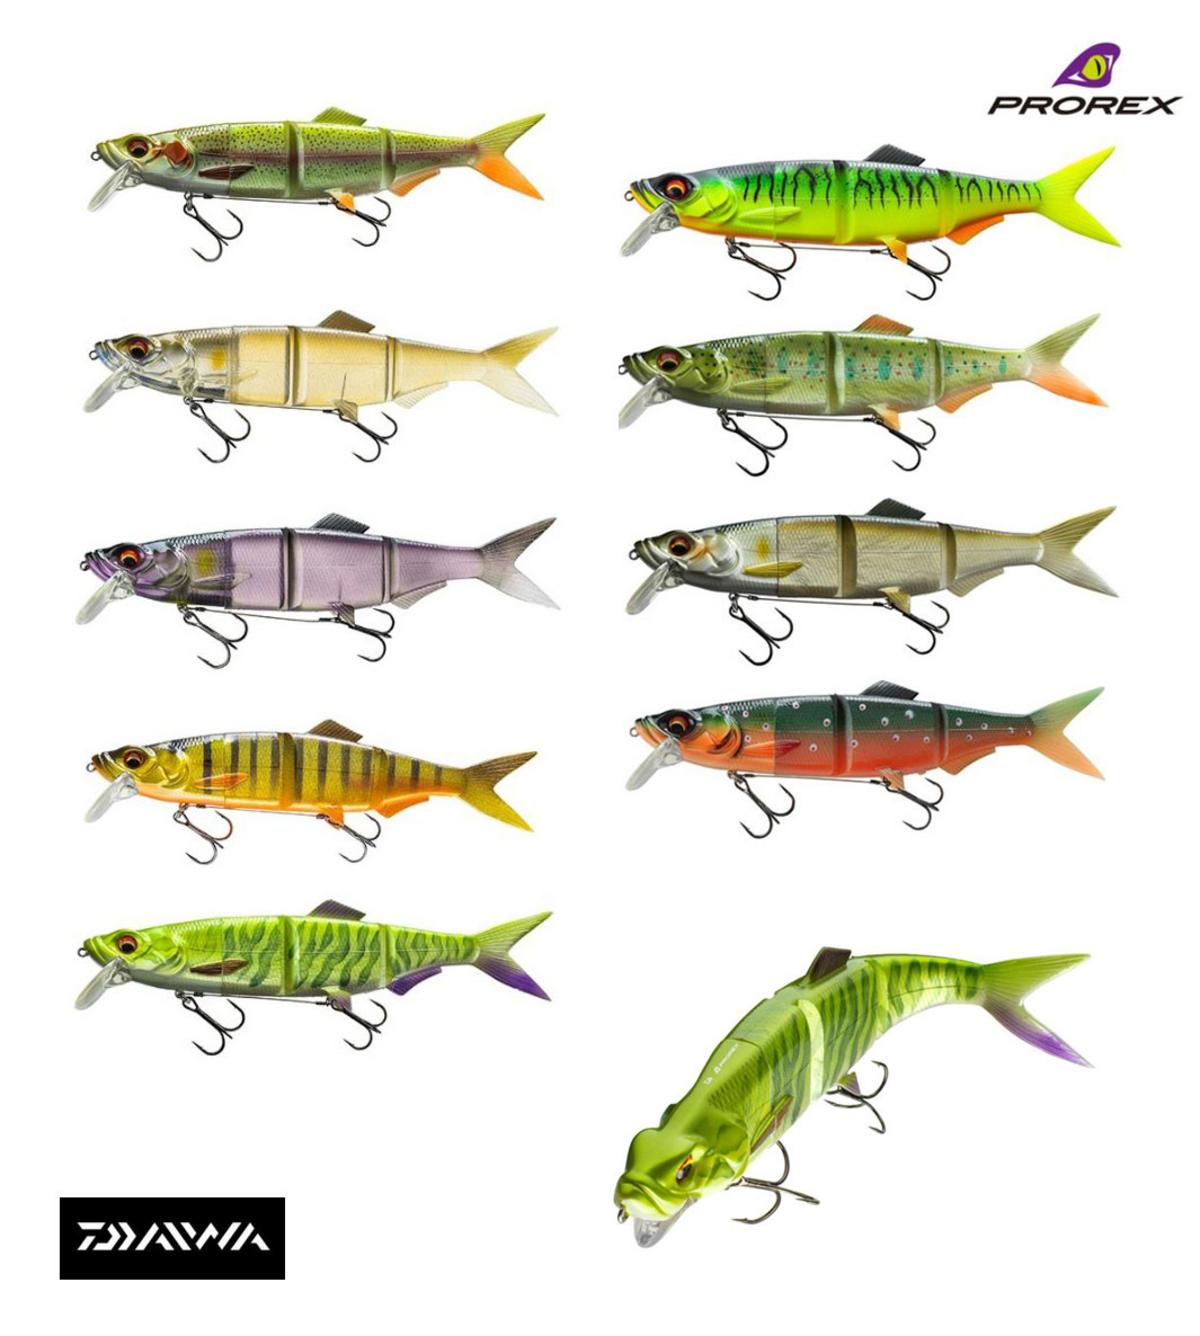 New Daiwa Prorex Hybrid Swimbait Lures 18cm / 25cm All Models - Colours